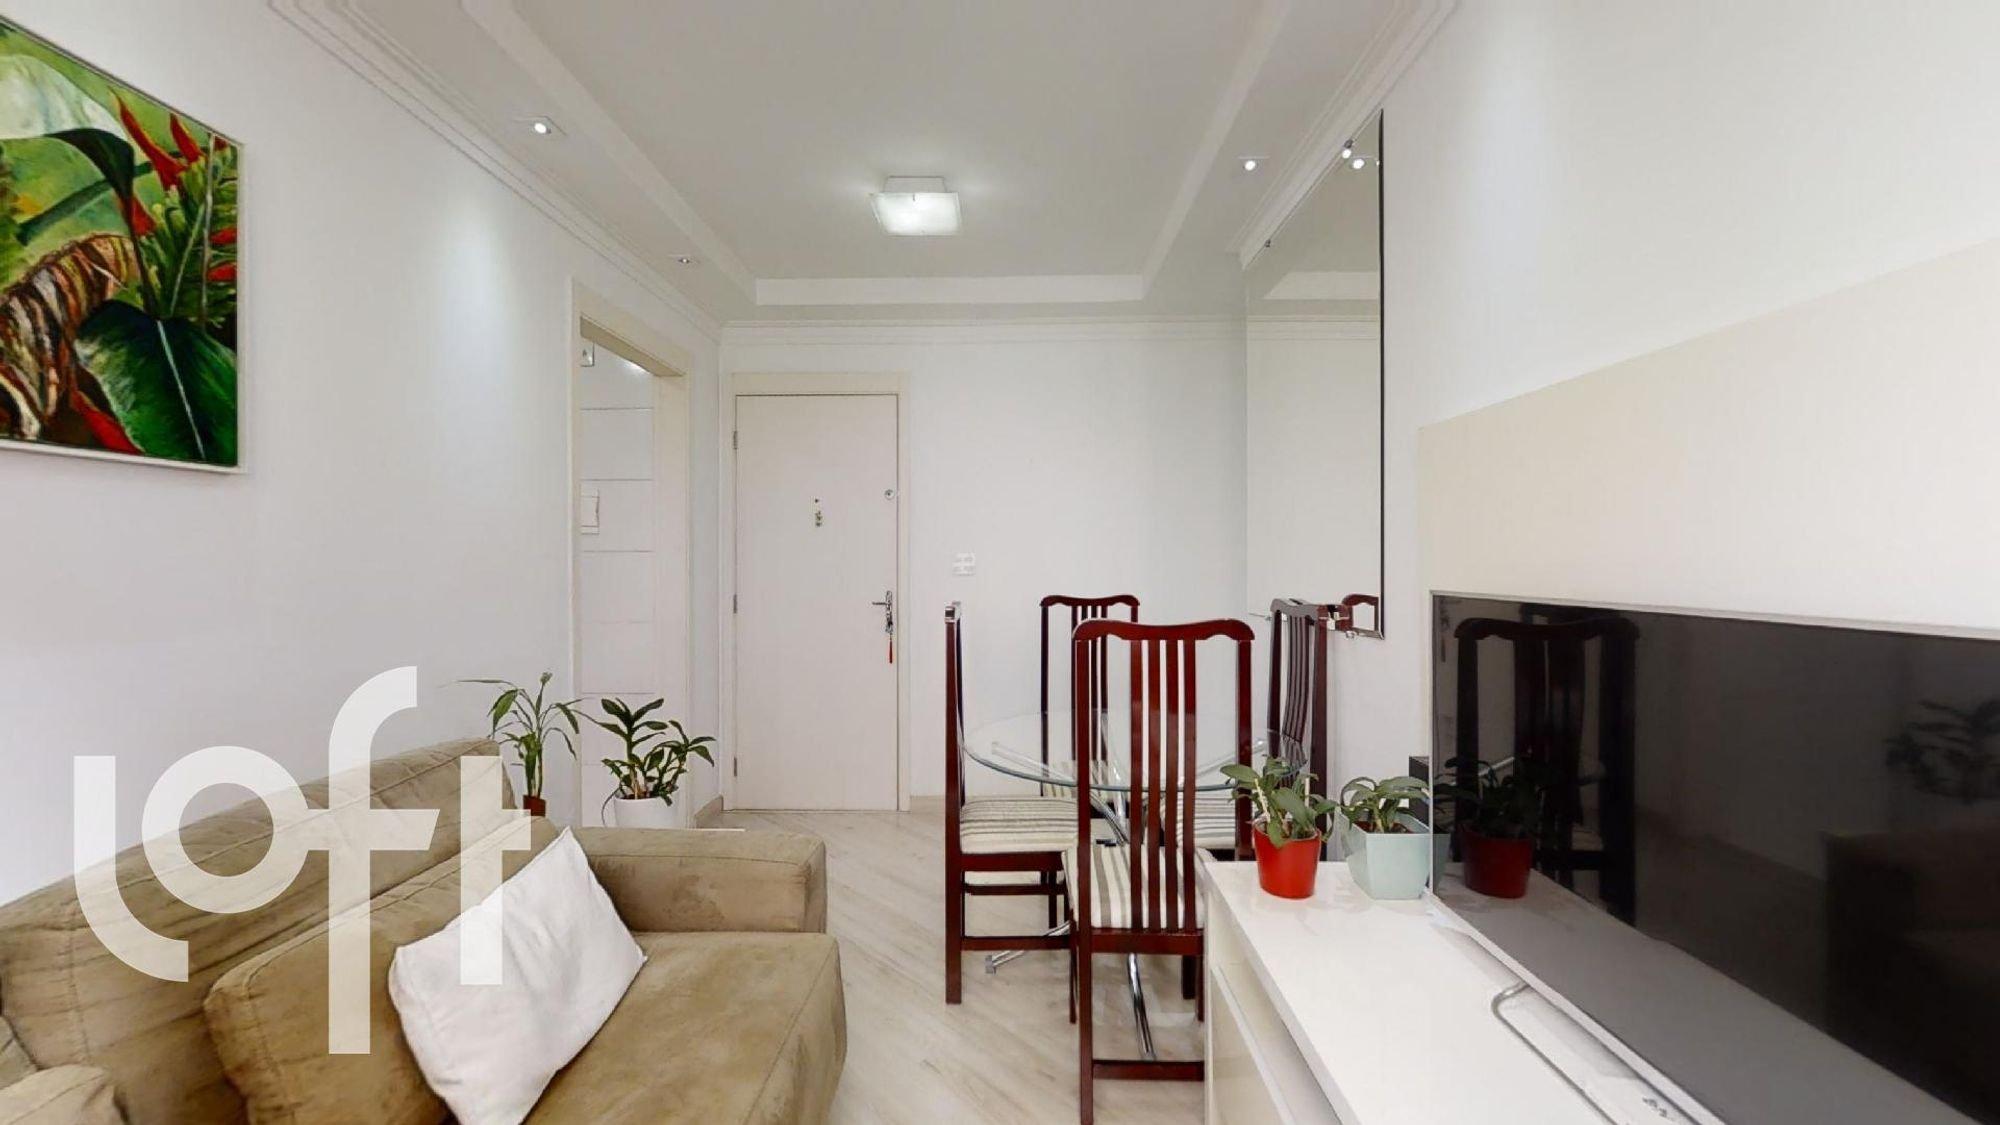 Foto de Sala com cama, vaso de planta, sofá